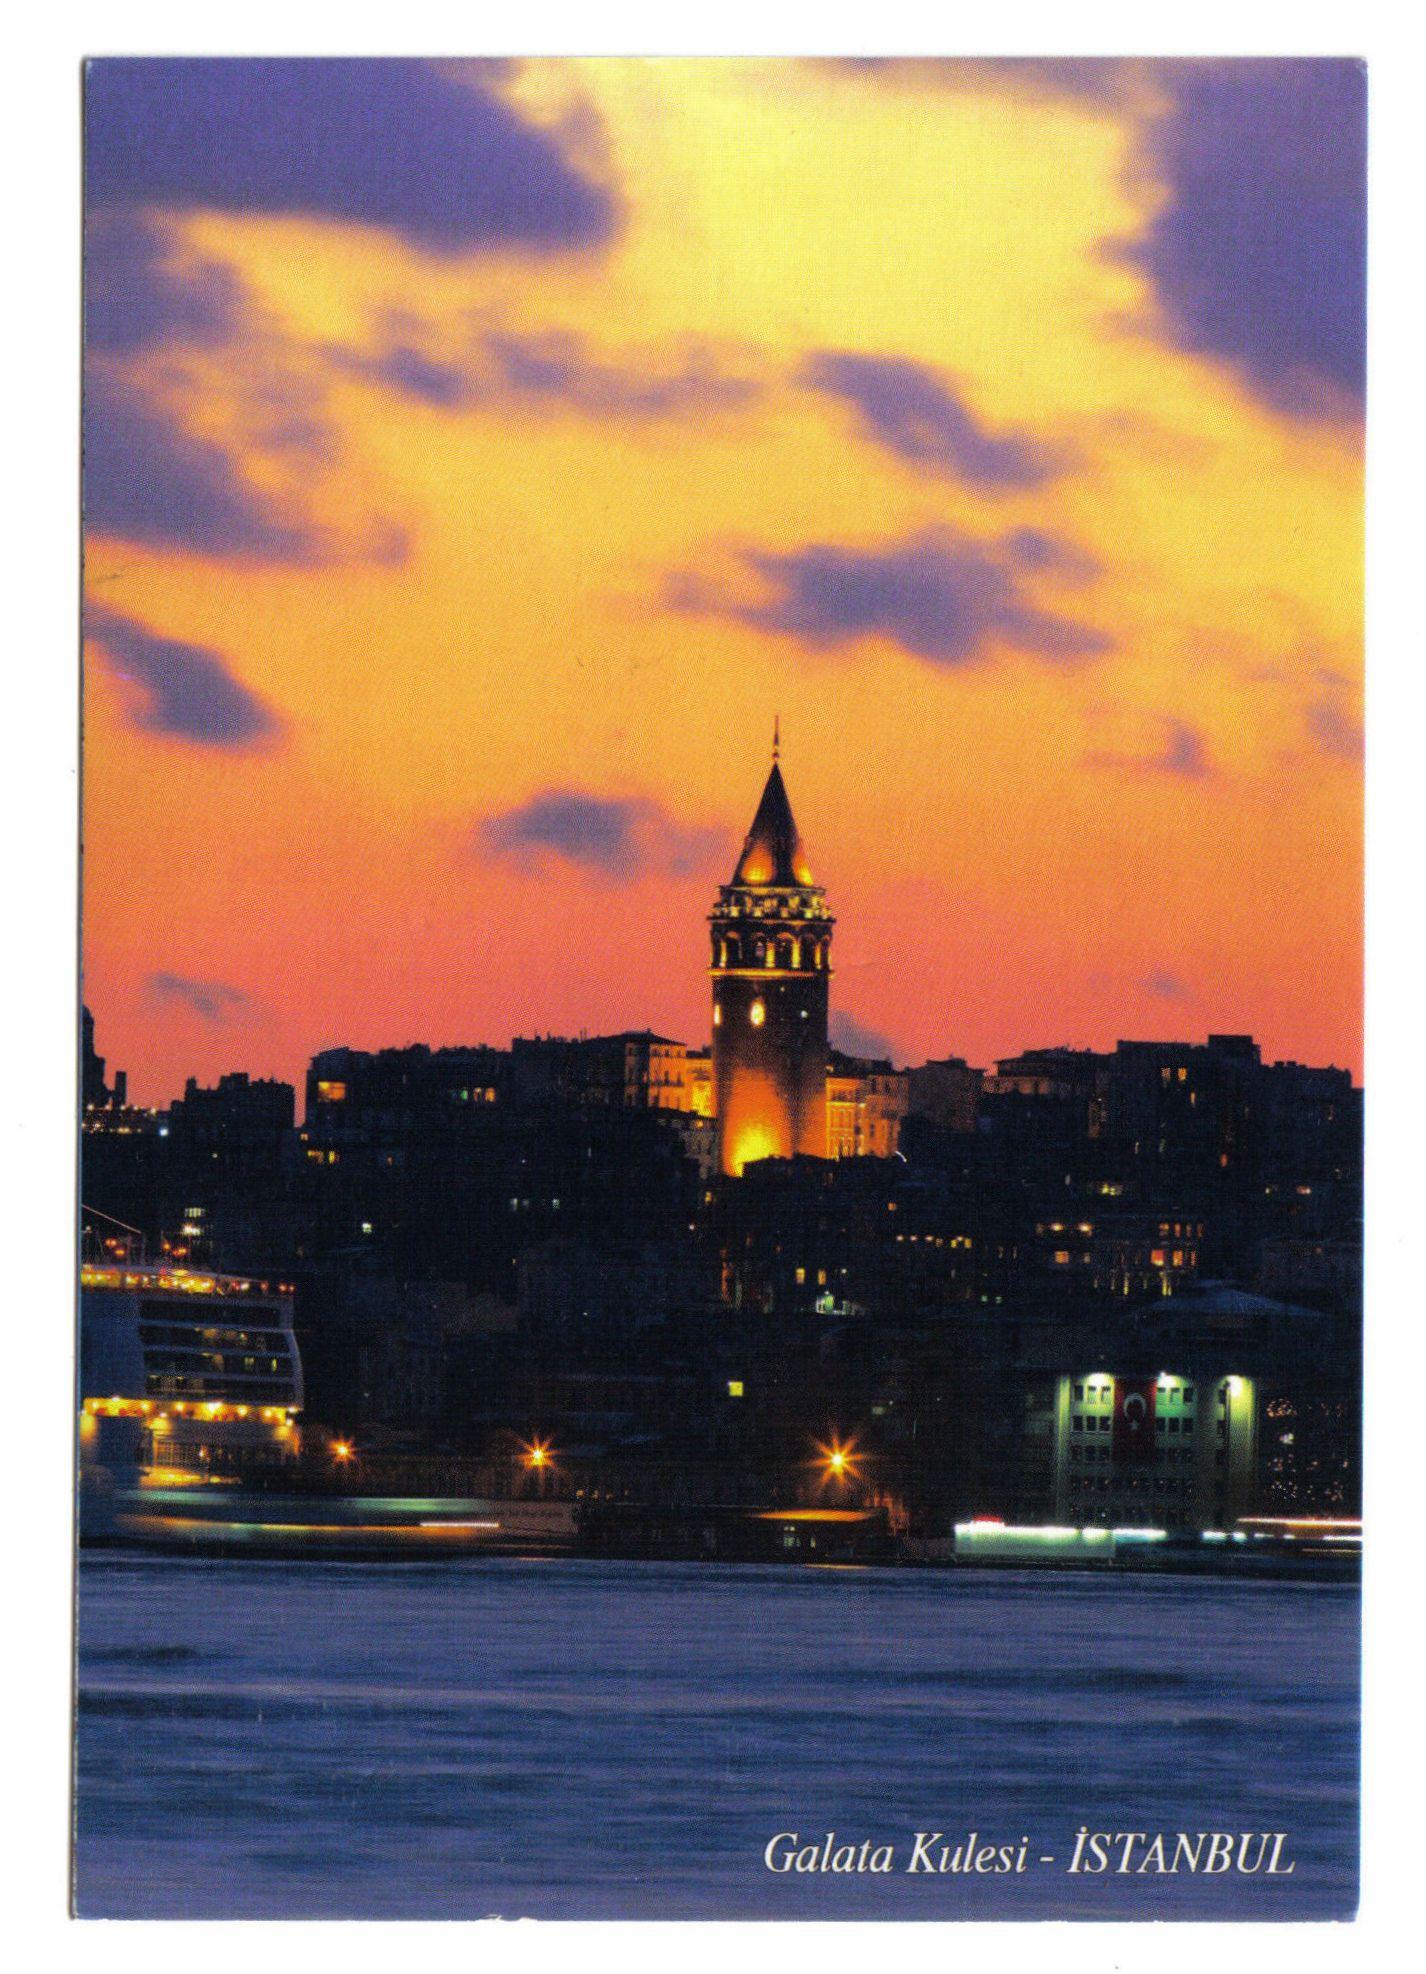 istanbul galata kulesi istanbul